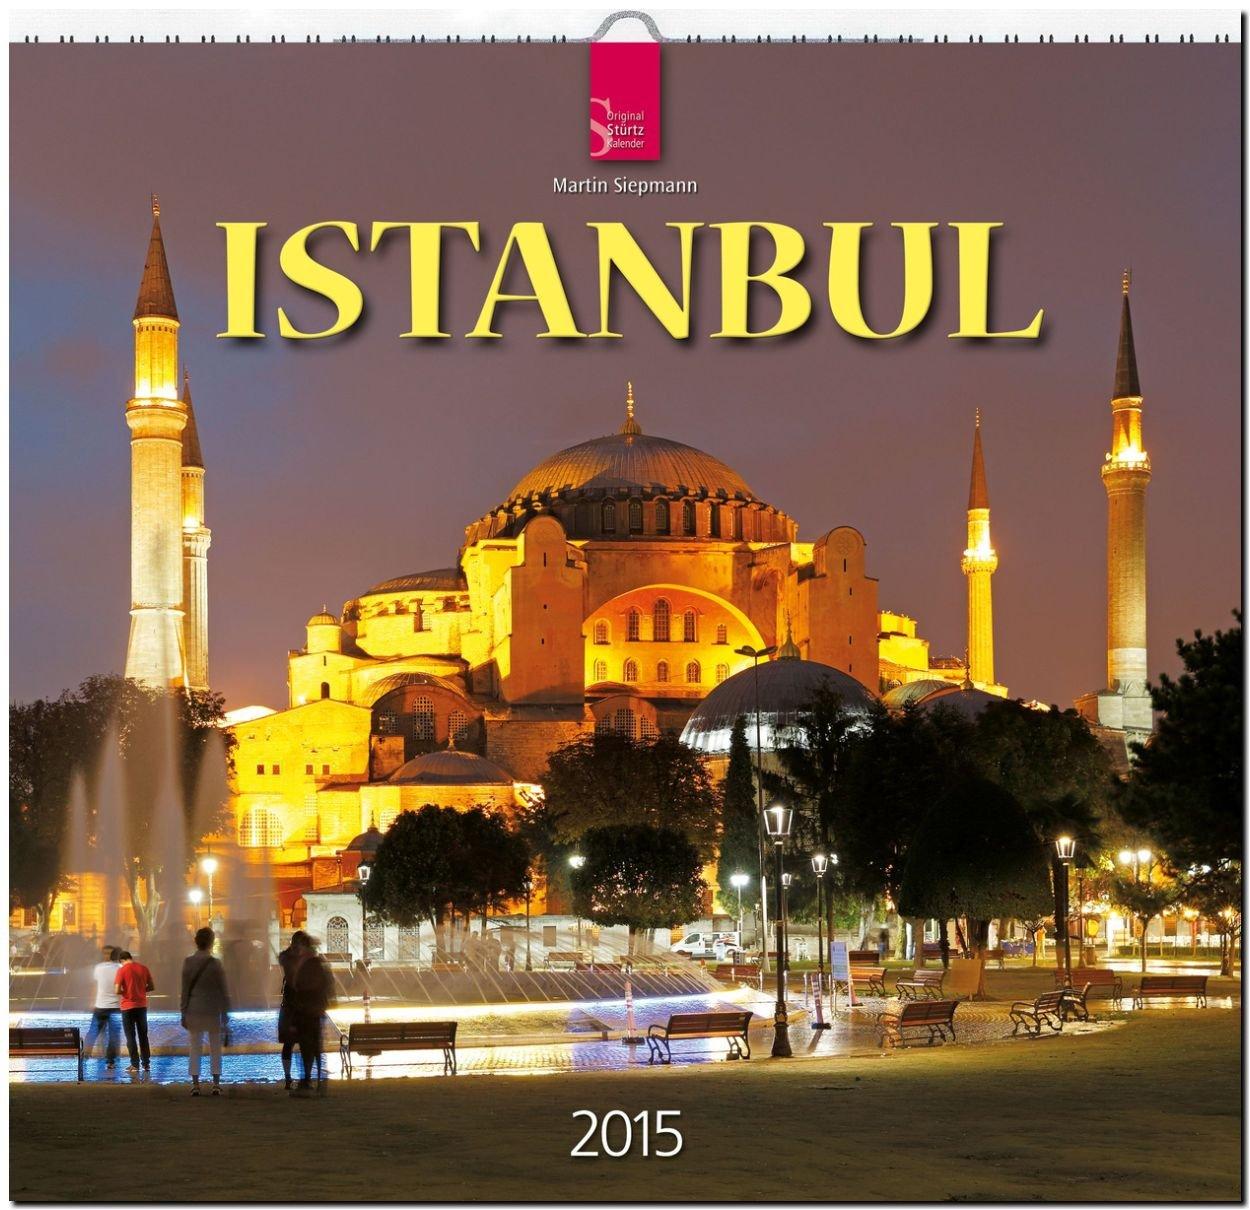 Istanbul 2015 - Original Stürtz-Kalender - Mittelformat-Kalender 33 x 31 cm